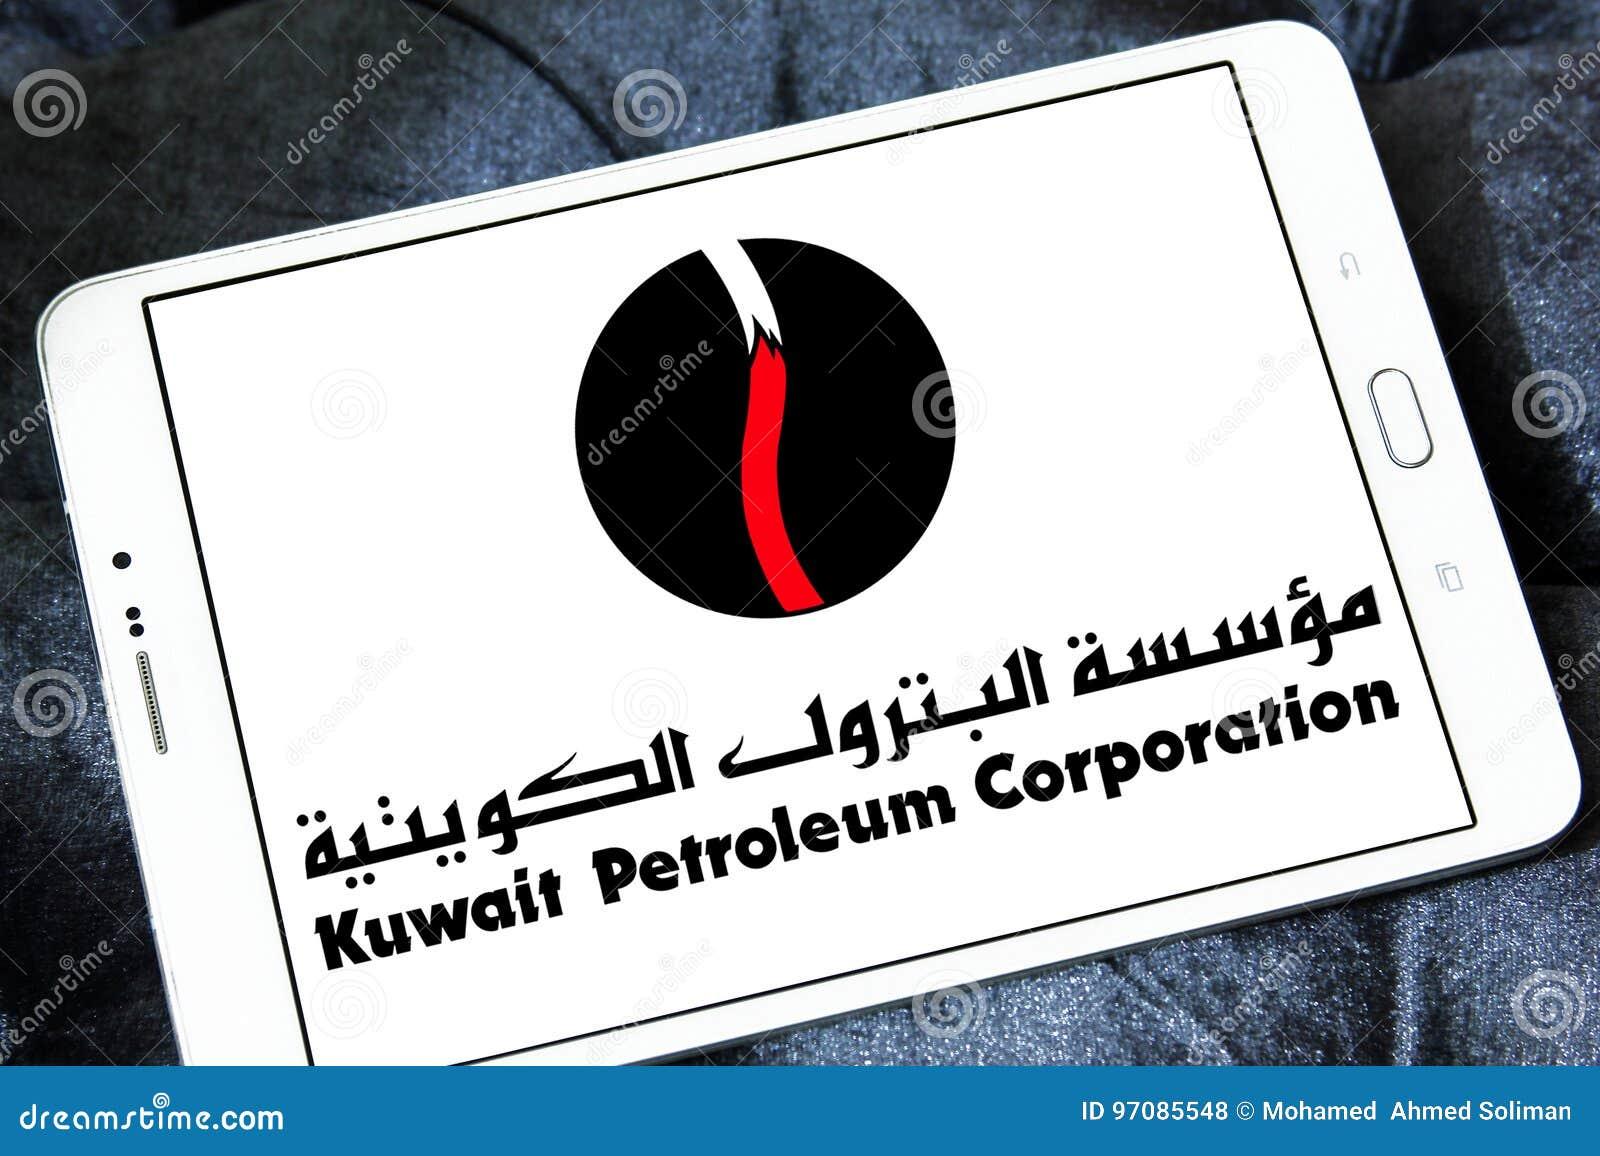 Kuwait Petroleum Corporation, KPC Logo Editorial Stock Photo